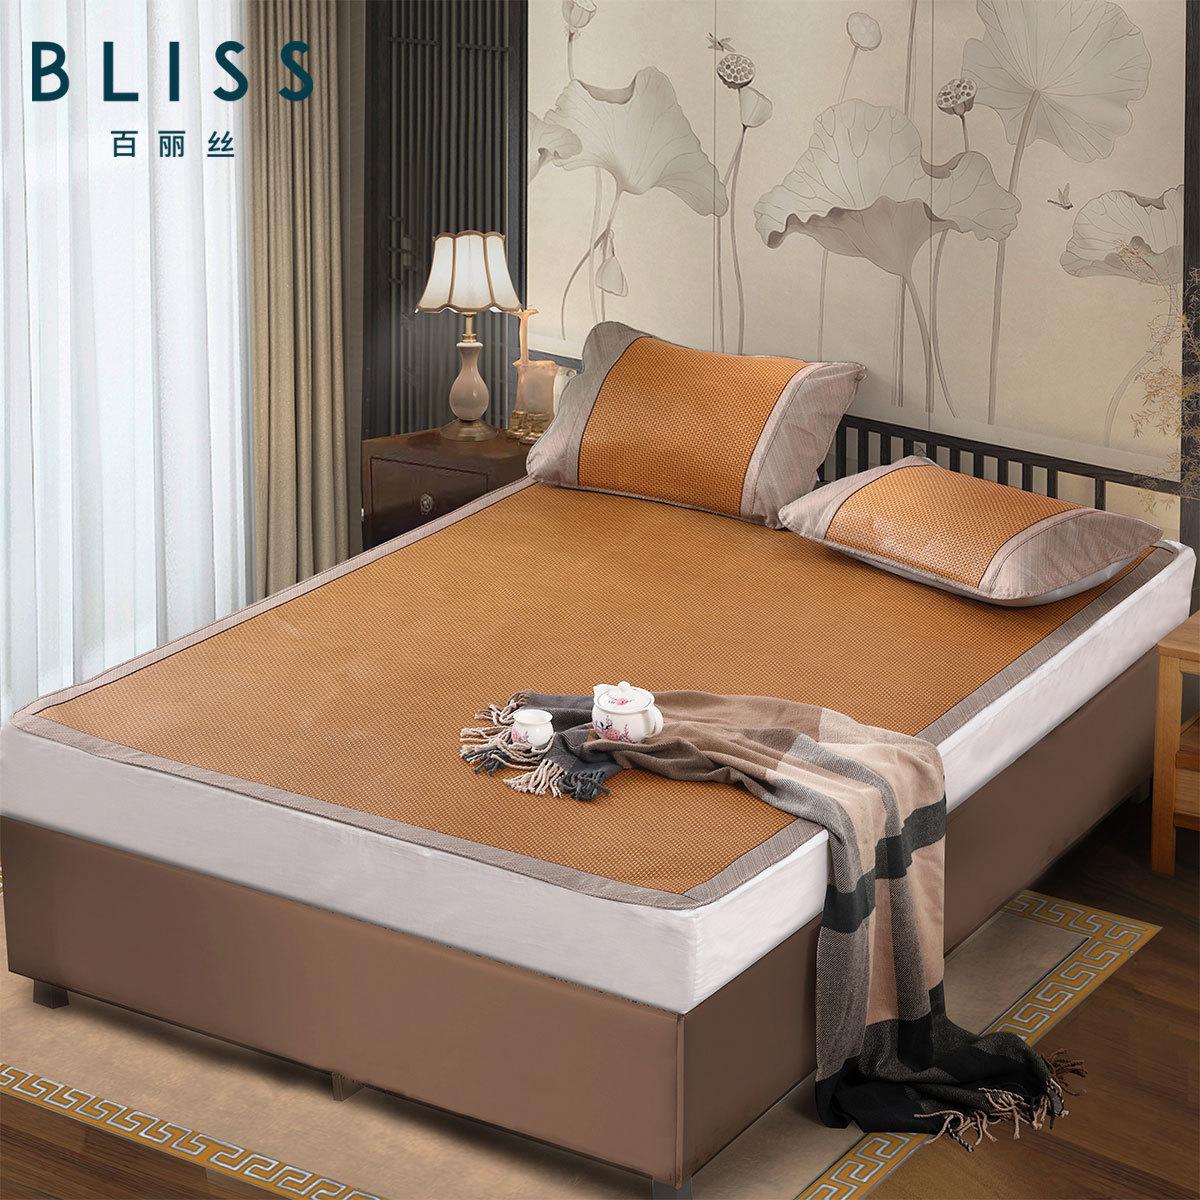 Декоративные одеяла и подушки / Прикроватные коврики Артикул 613270385762